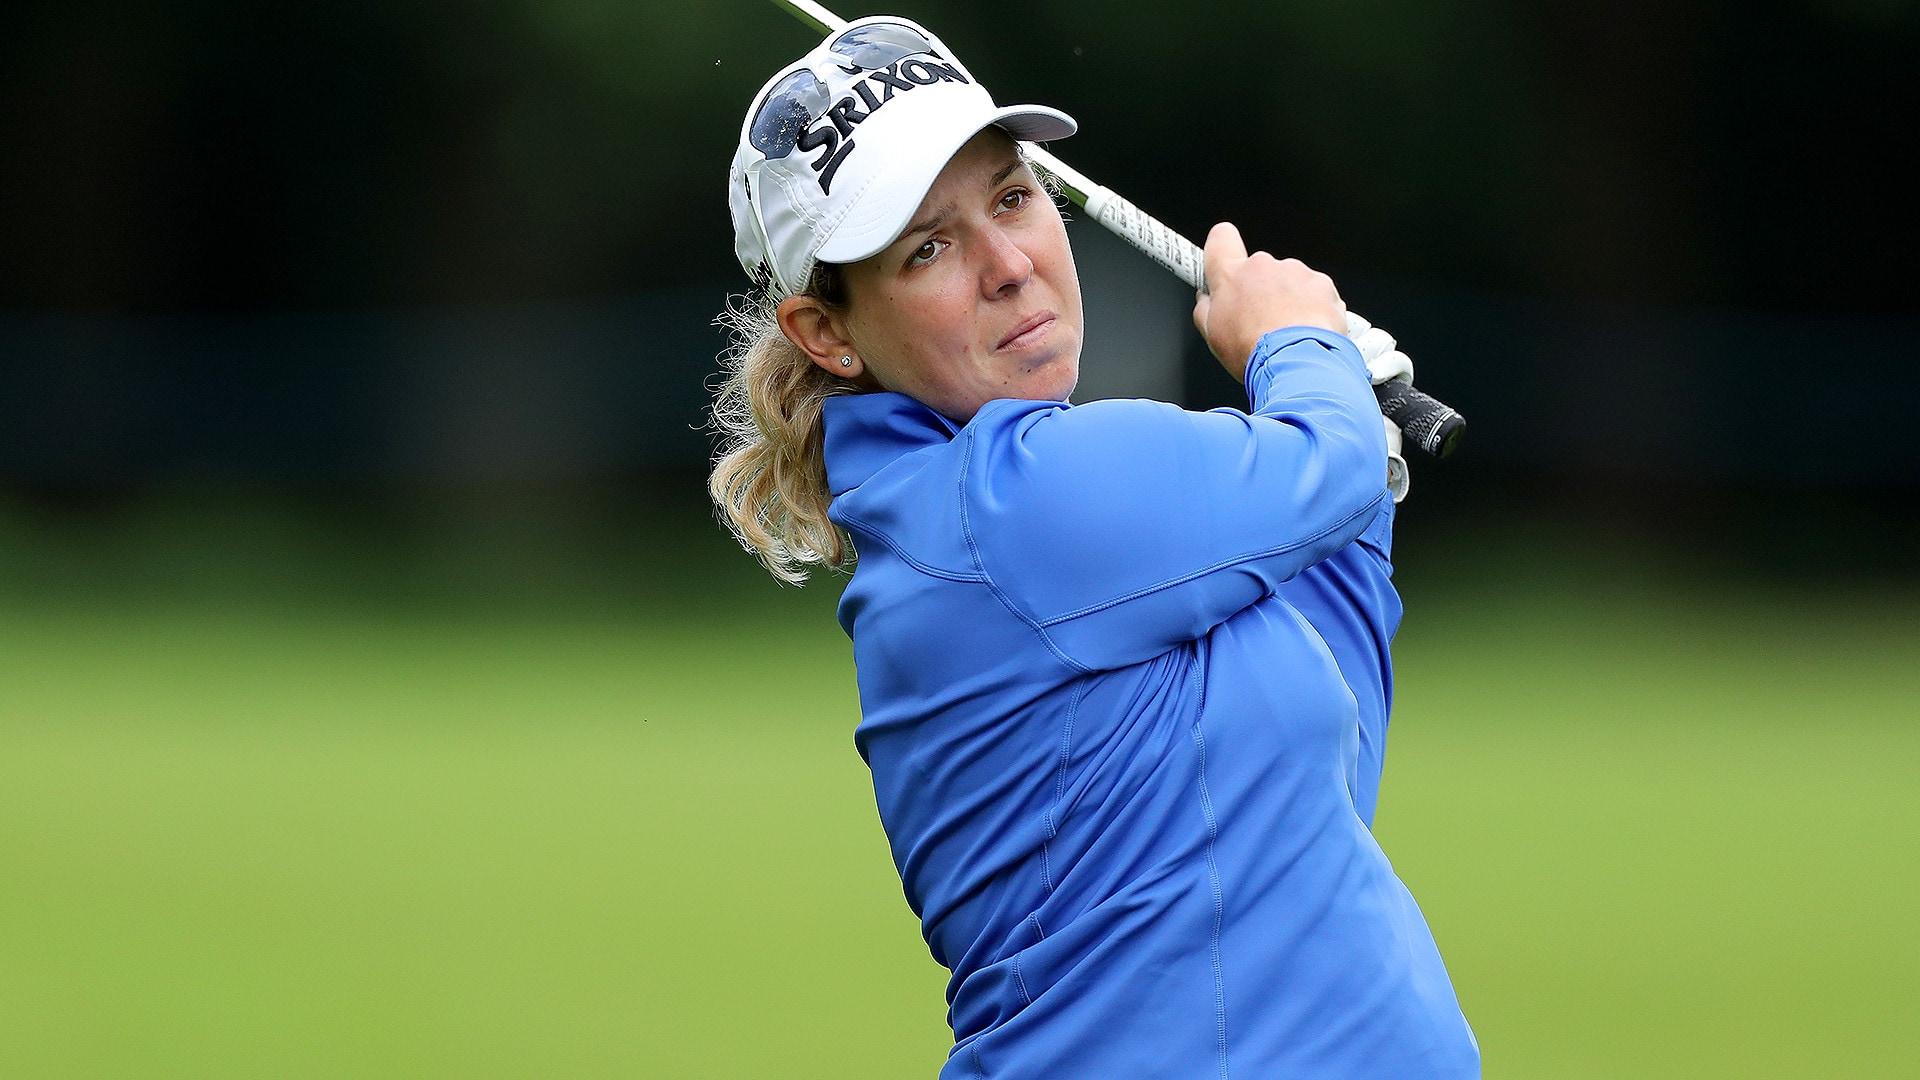 LPGA Tour: Danielle Kang one ahead at Tournament of